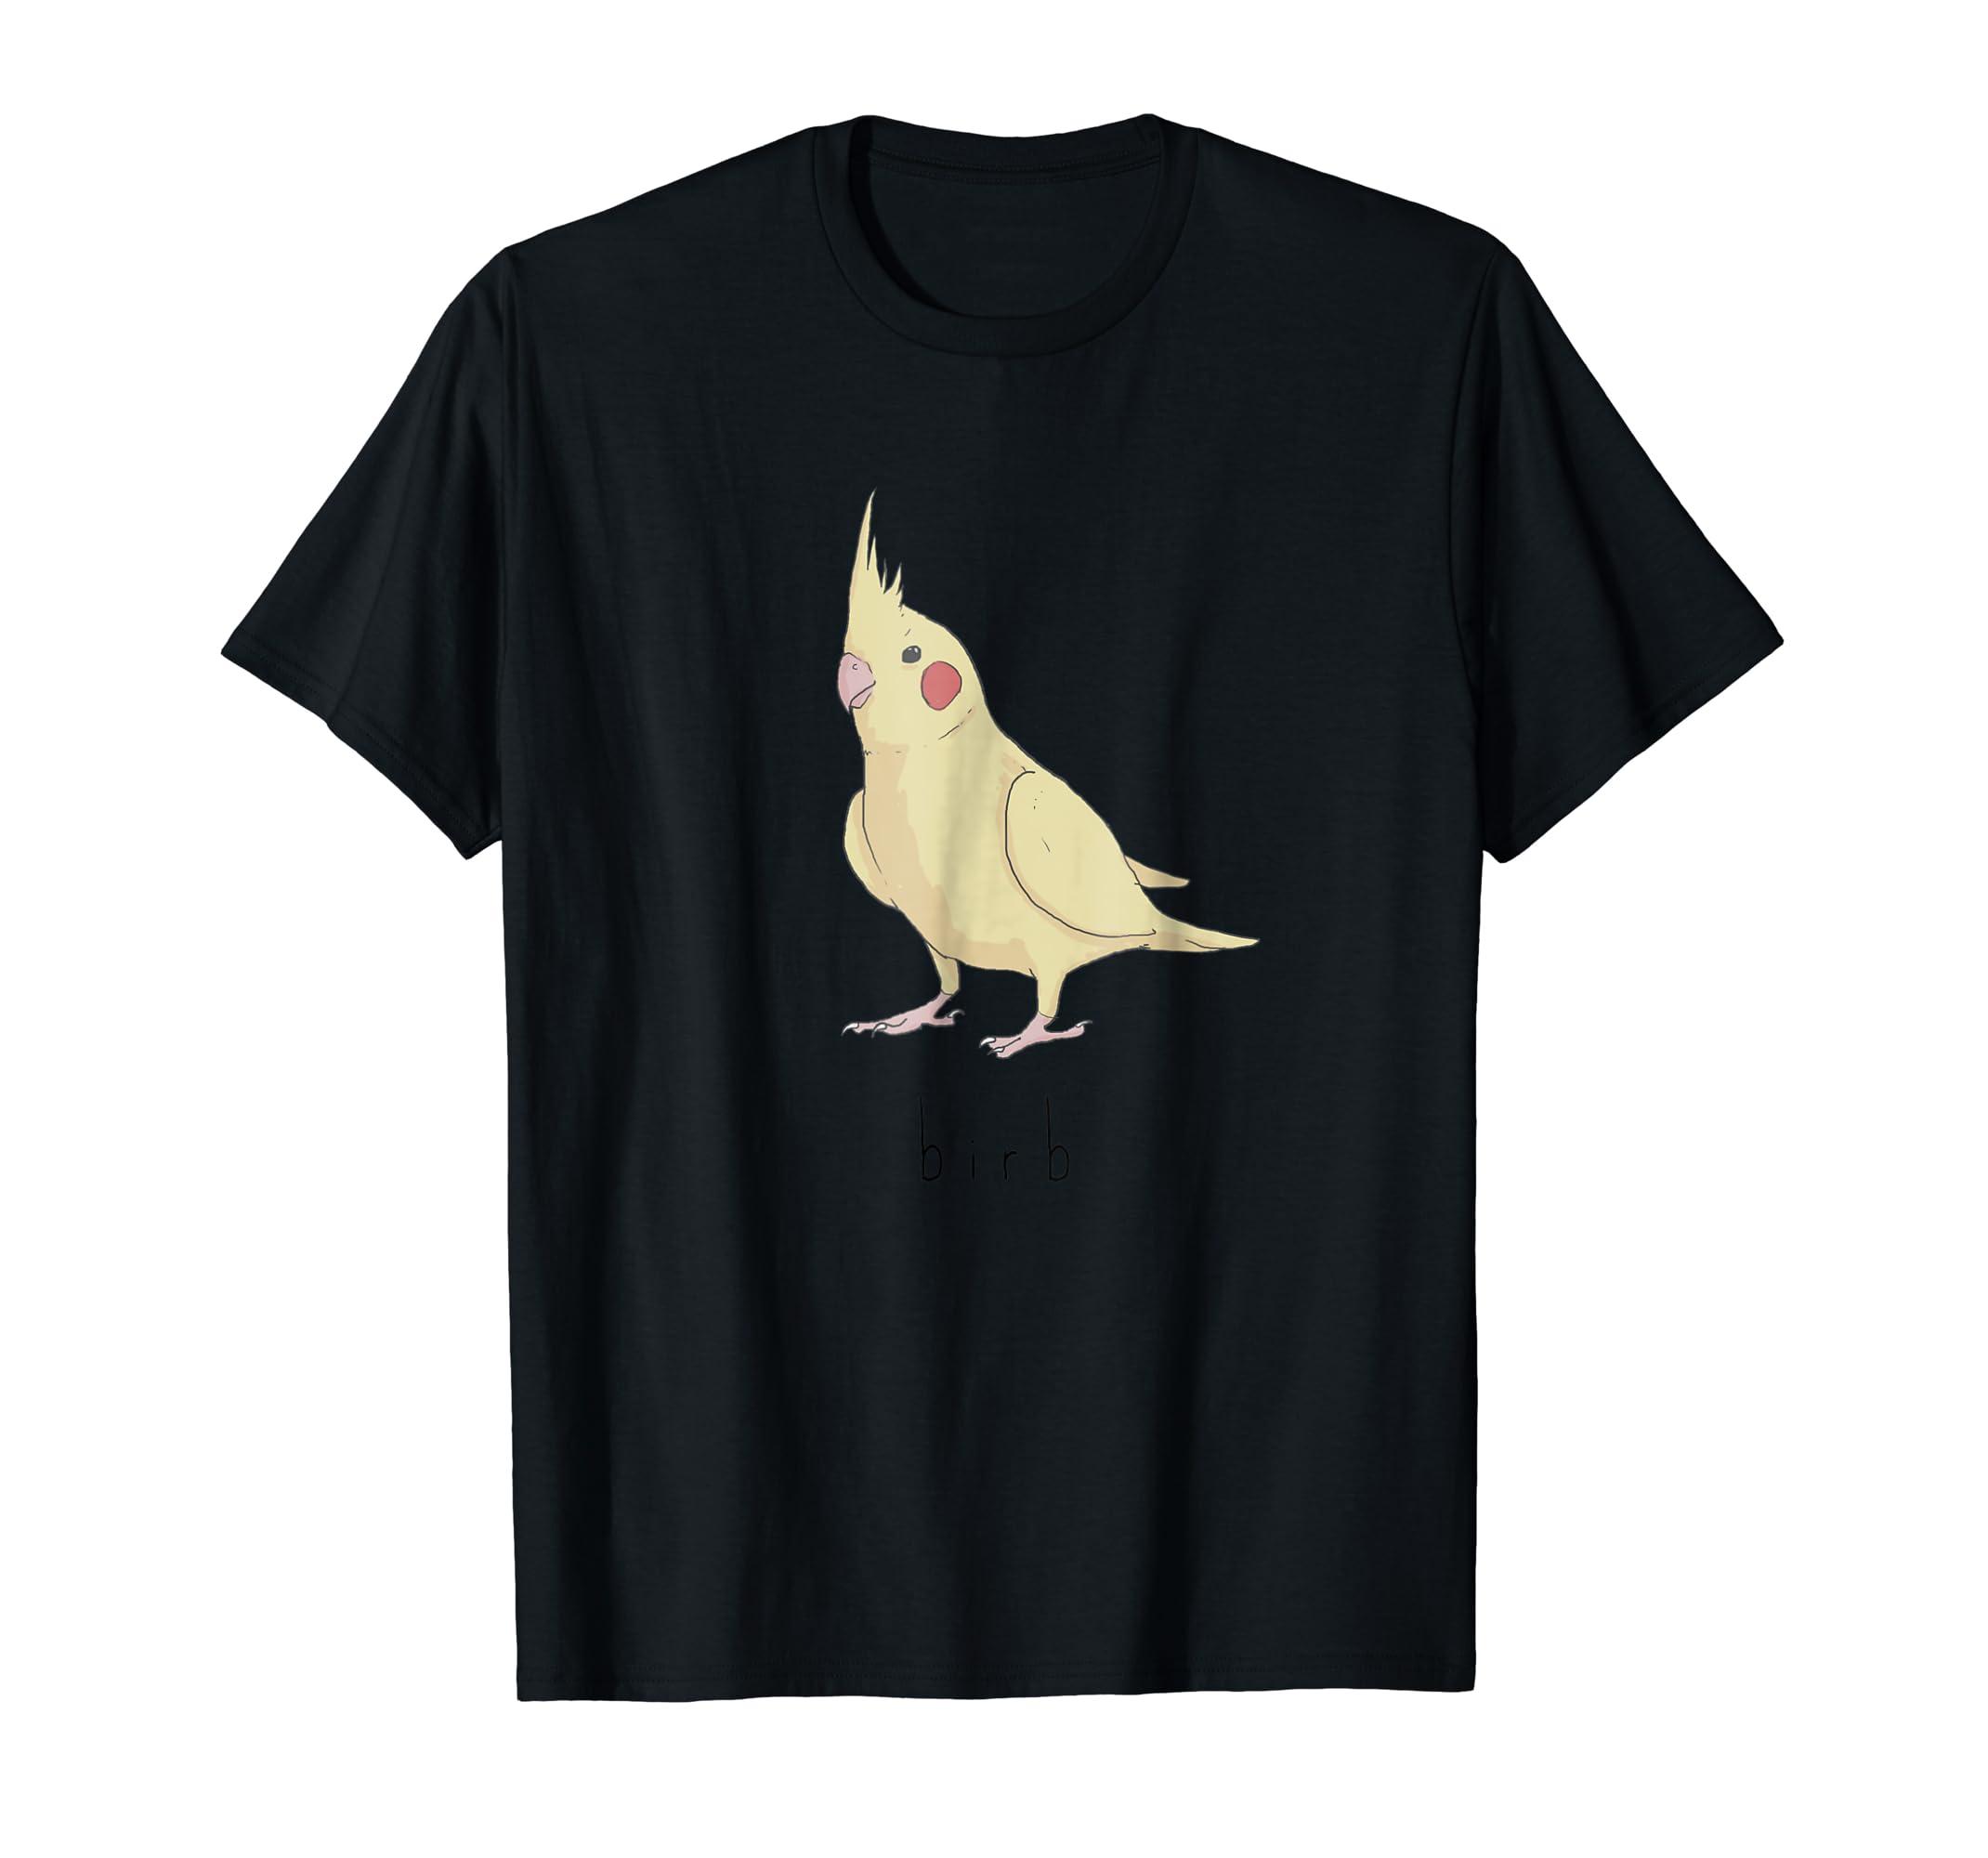 Birb Meme Shirt - Yellow Cockatiel Bird T-shirt-Men's T-Shirt-Black